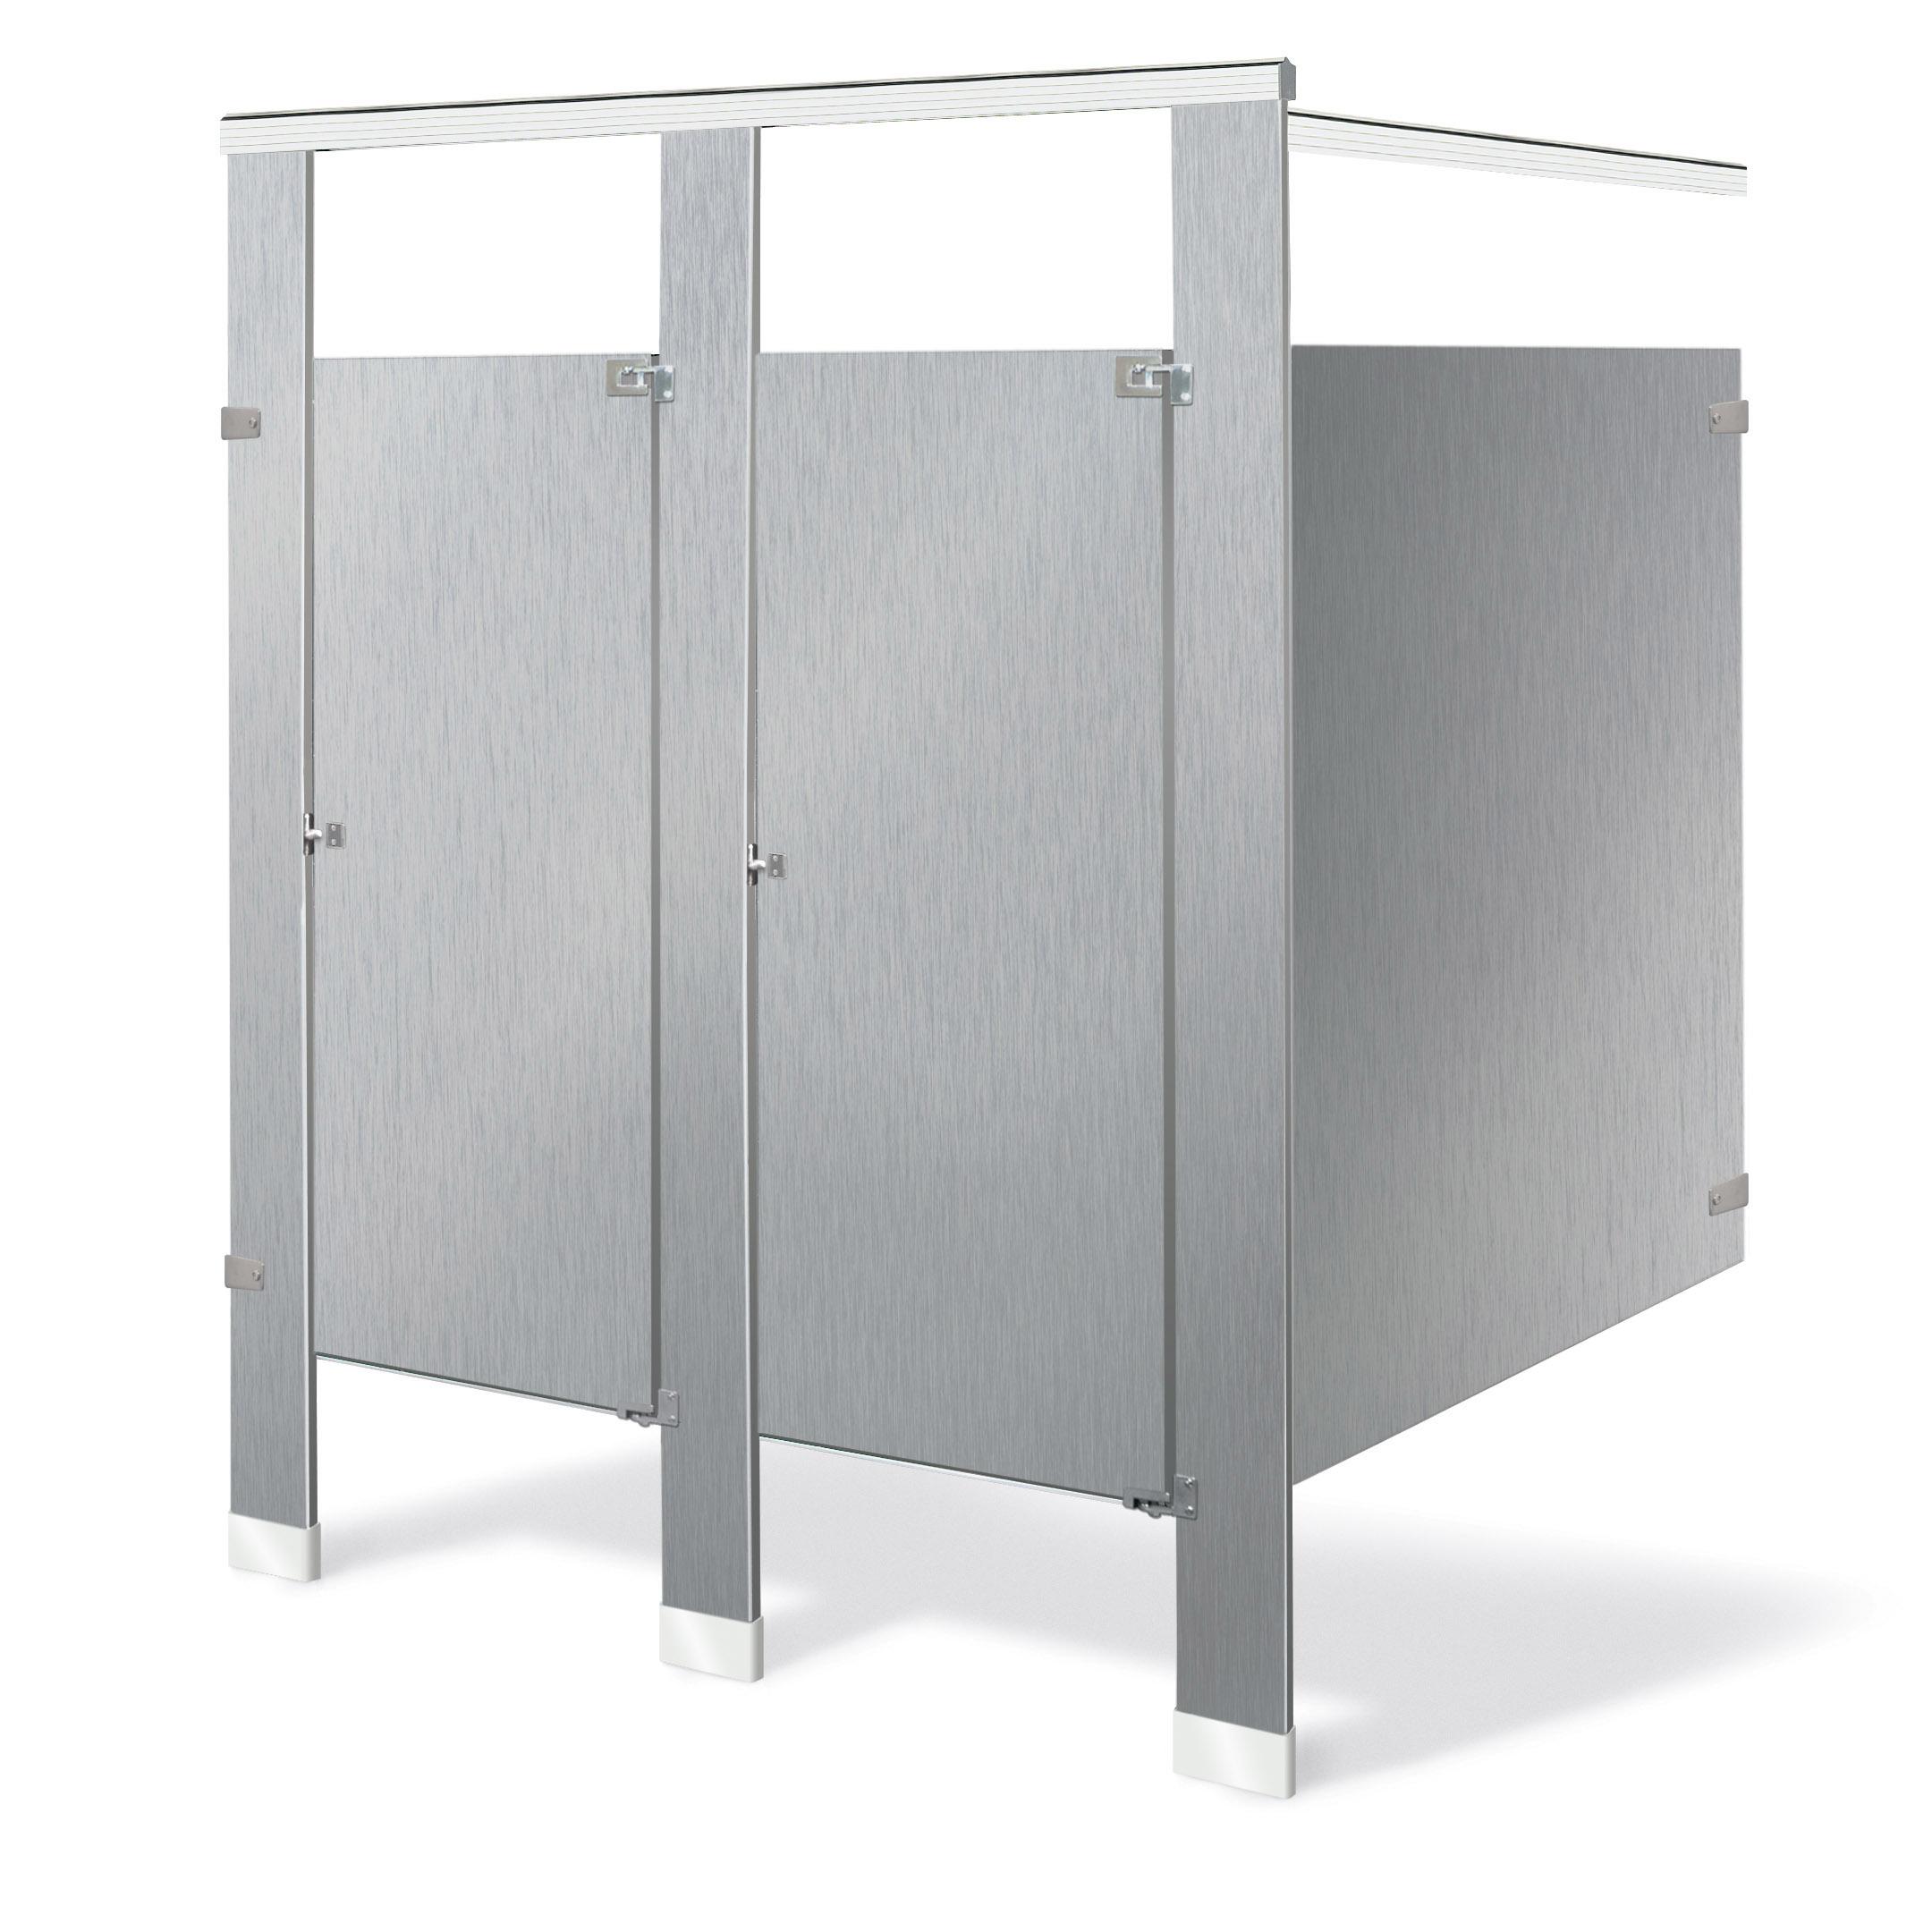 bradley mills stainless steel bathroom partitions